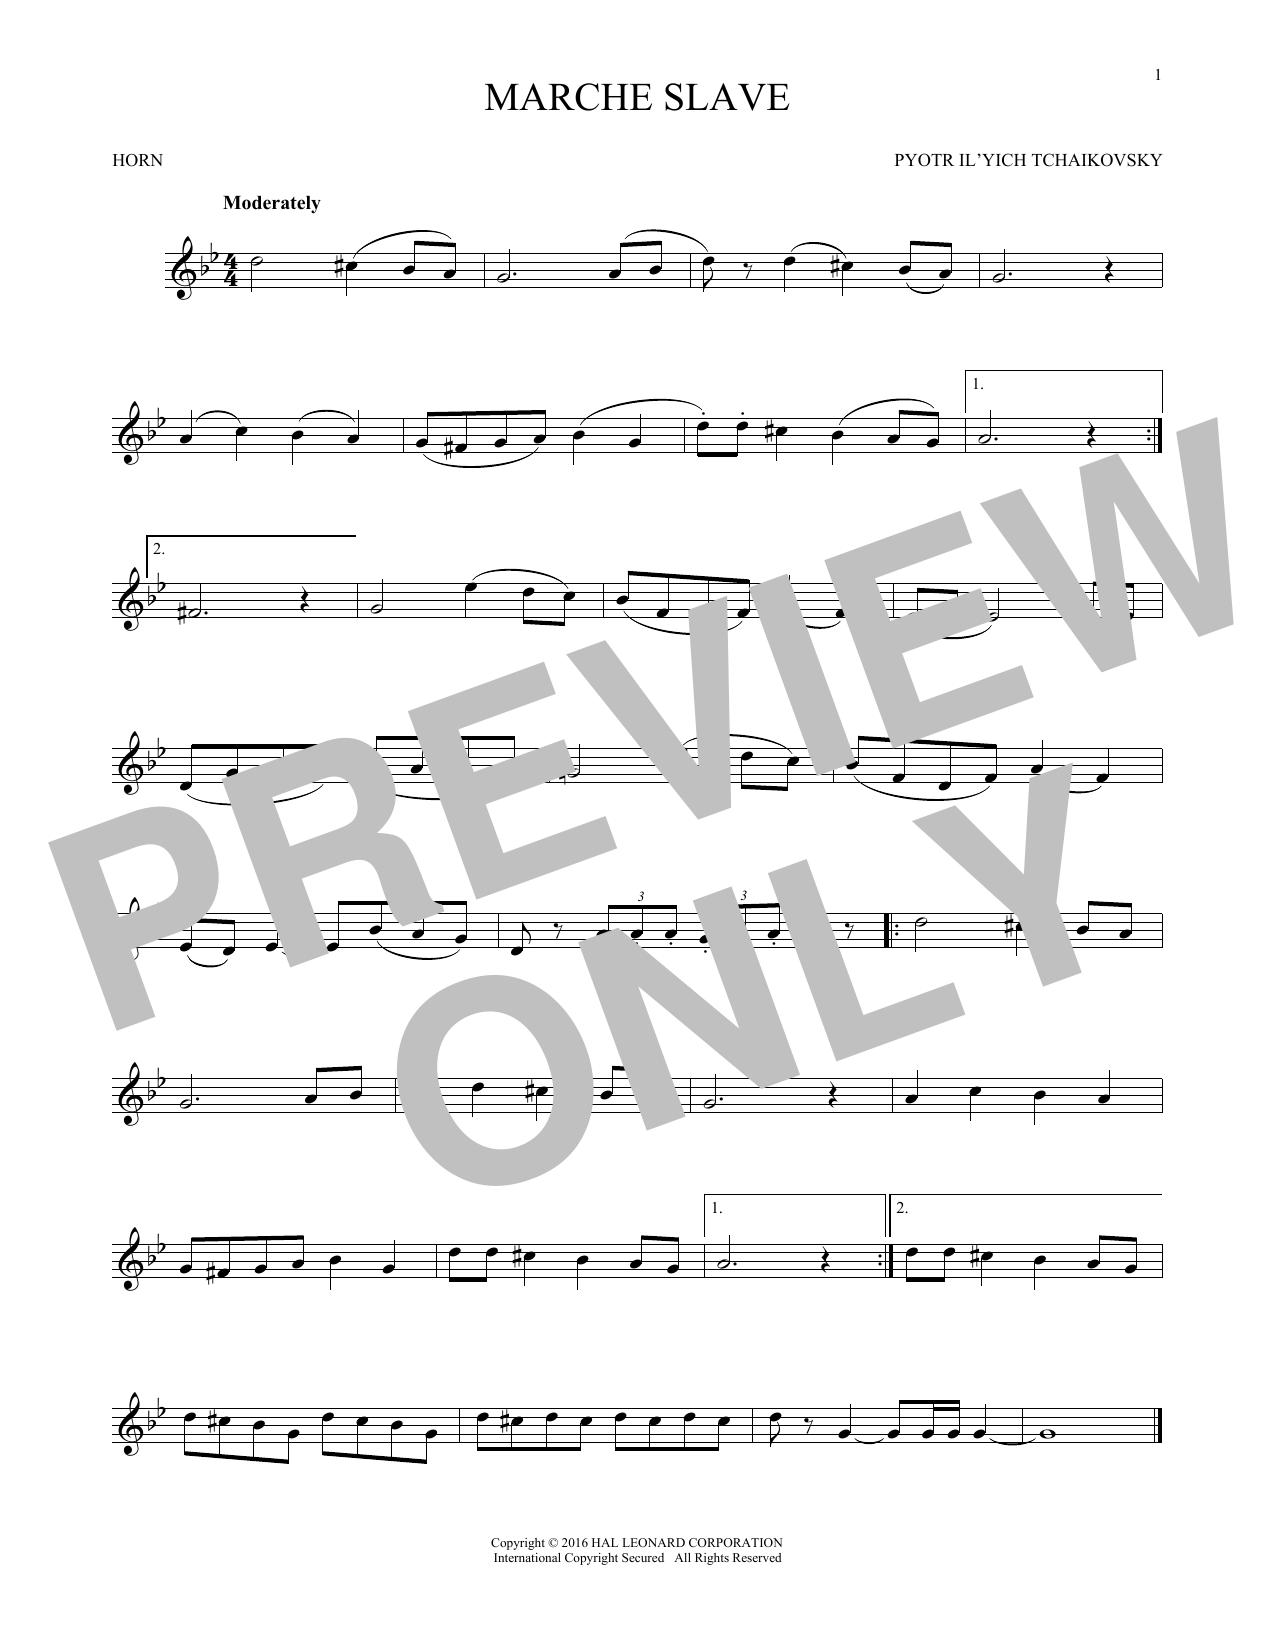 Marche Slav, Op. 31 (French Horn Solo)